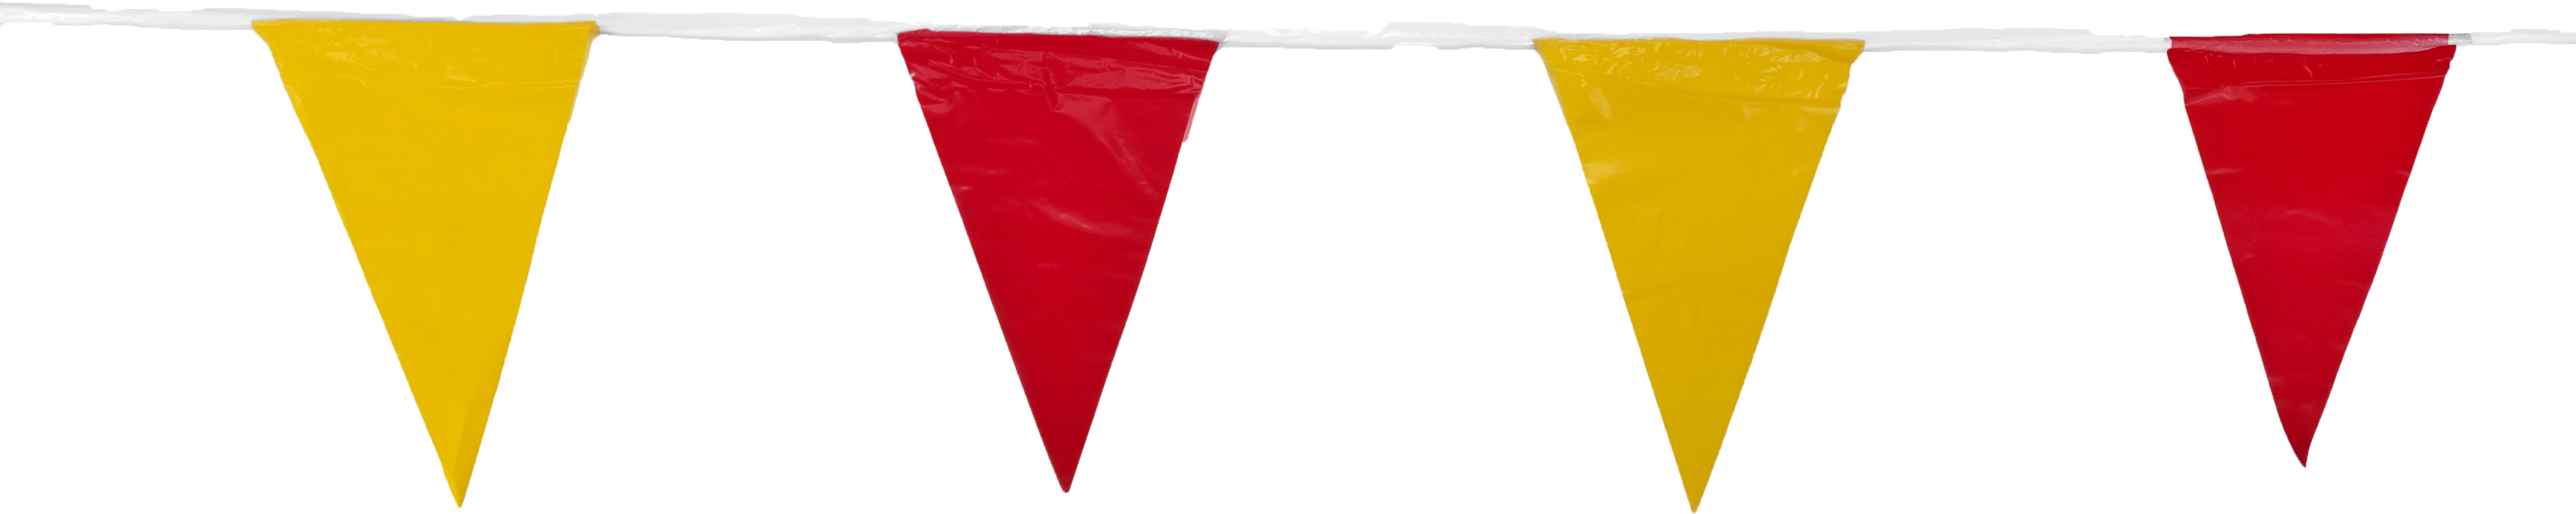 Pack of 10 Mutual Industries 15903-7941 OSHA Perimeter Marker Red//Yellow